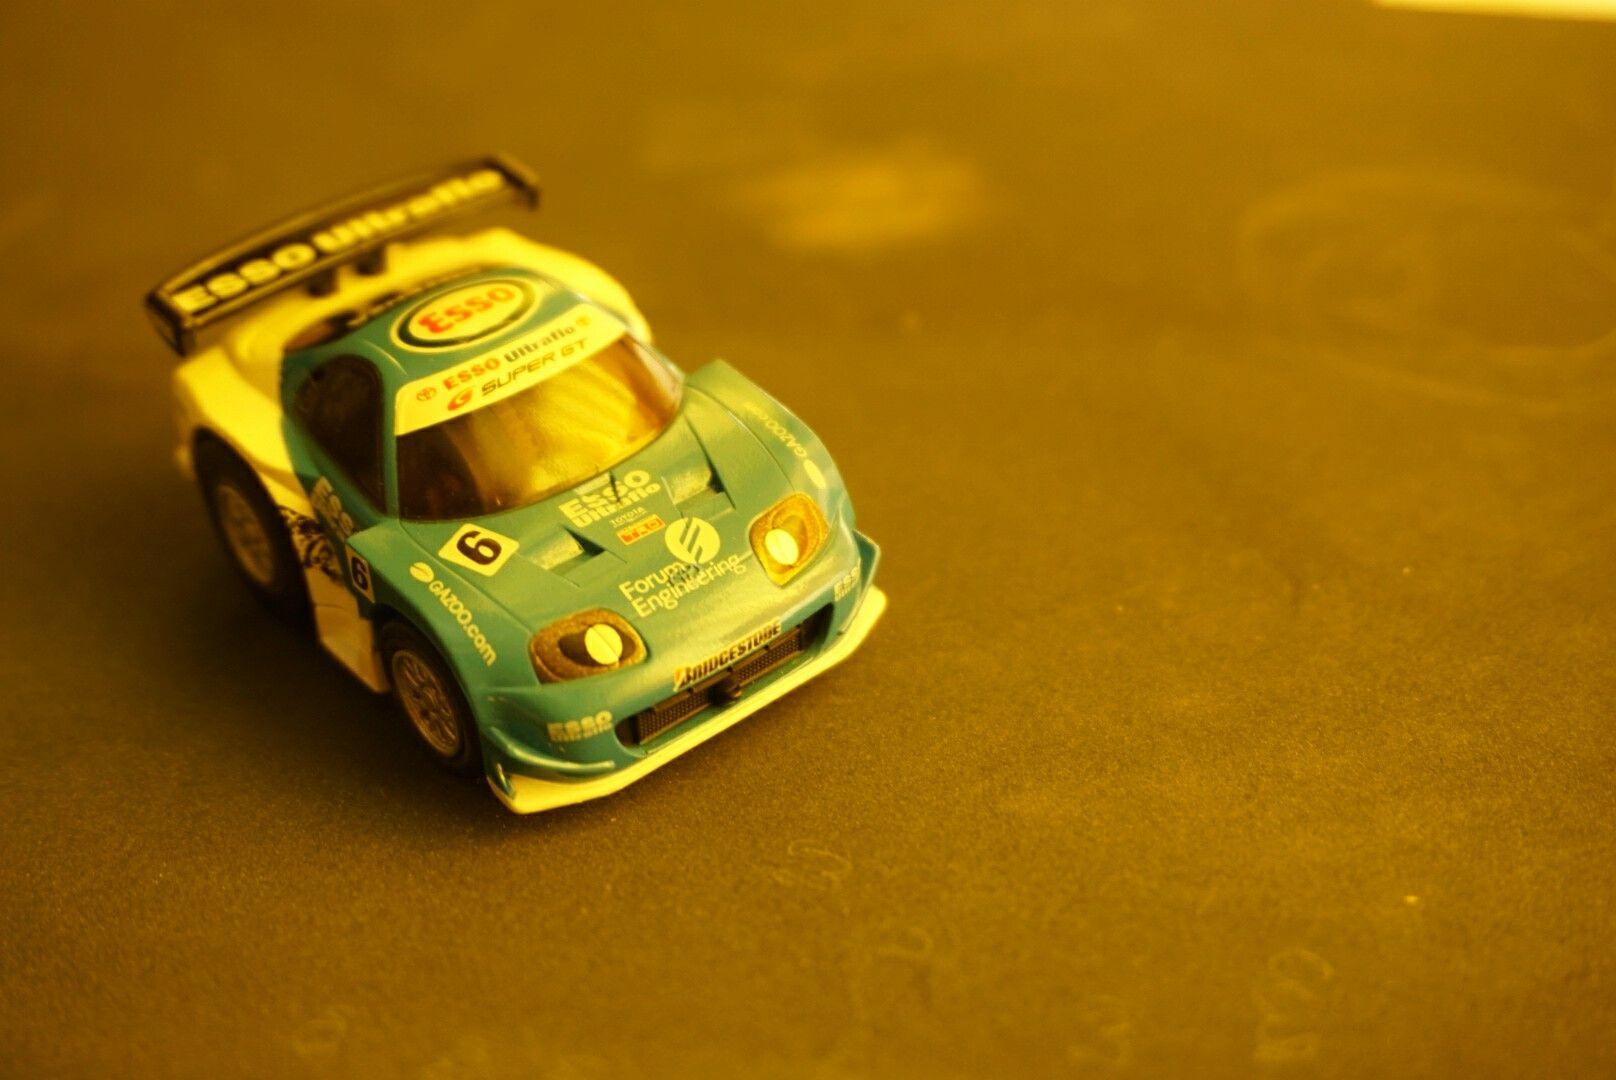 Choro Q Supra Esso Designer Toys Toy Car Cartoon Styles